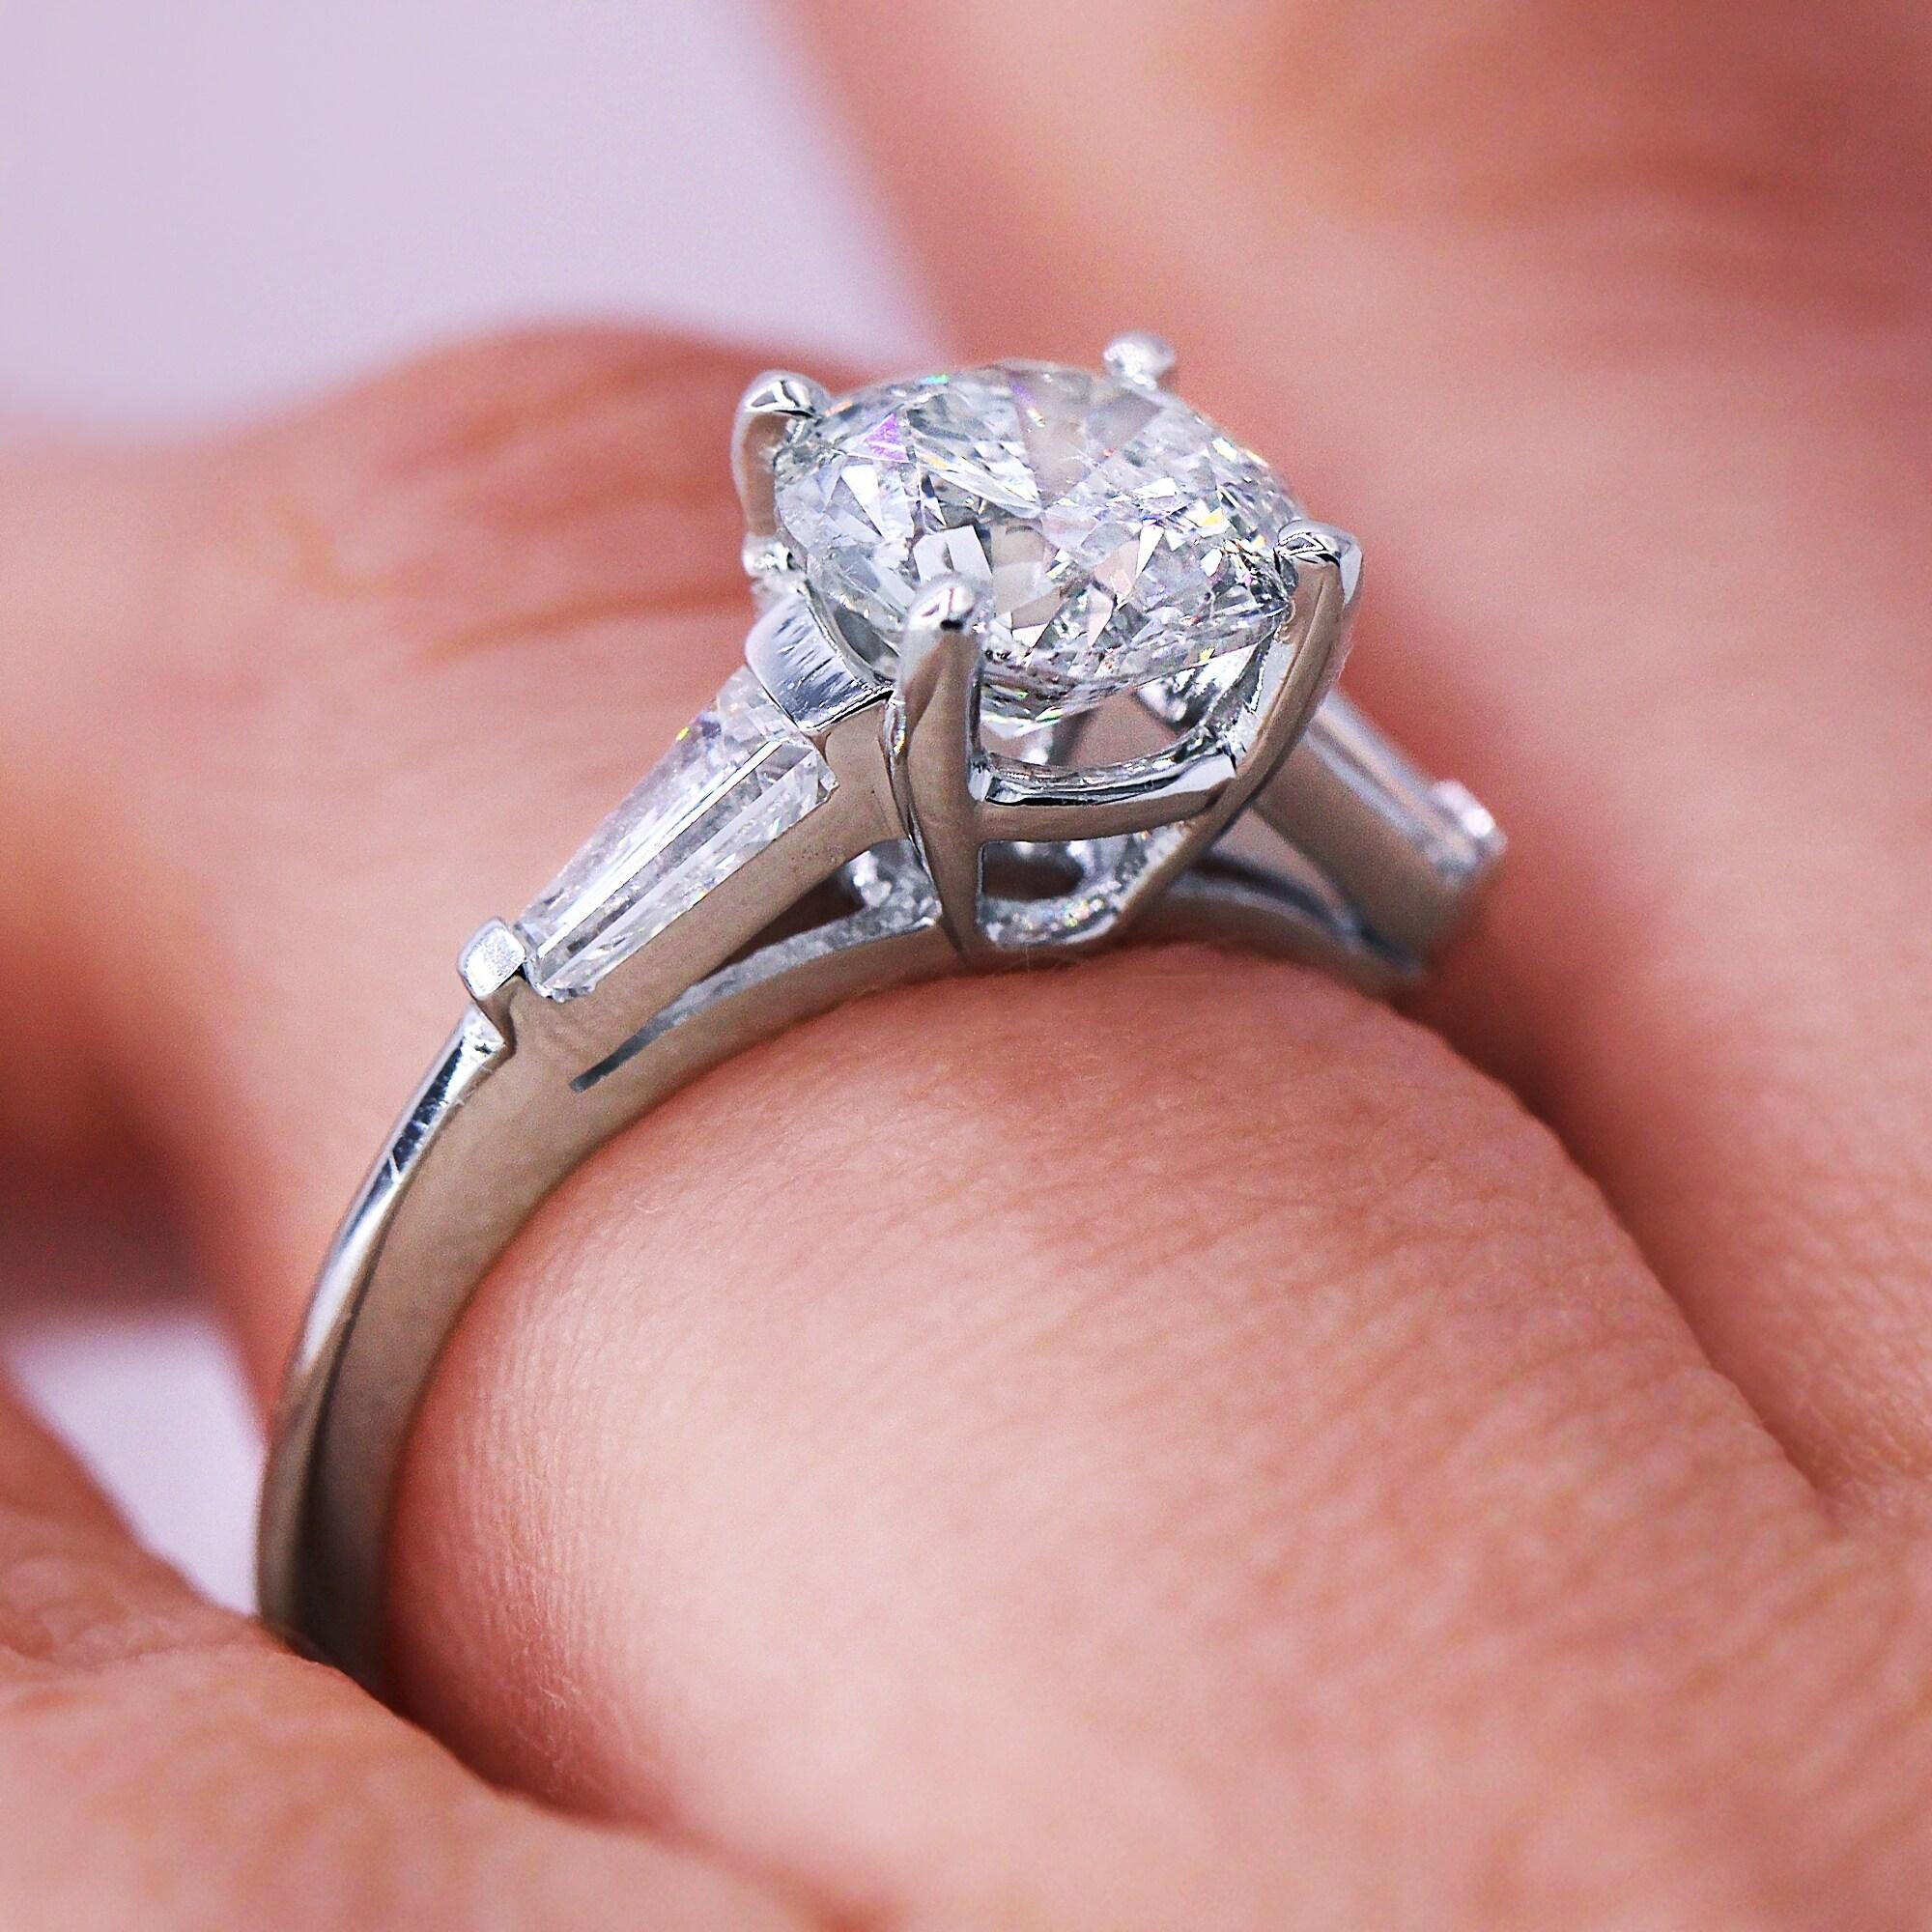 Shop 18KT White Gold 2.03 Ct Certified Round Three-Stone Diamond ...